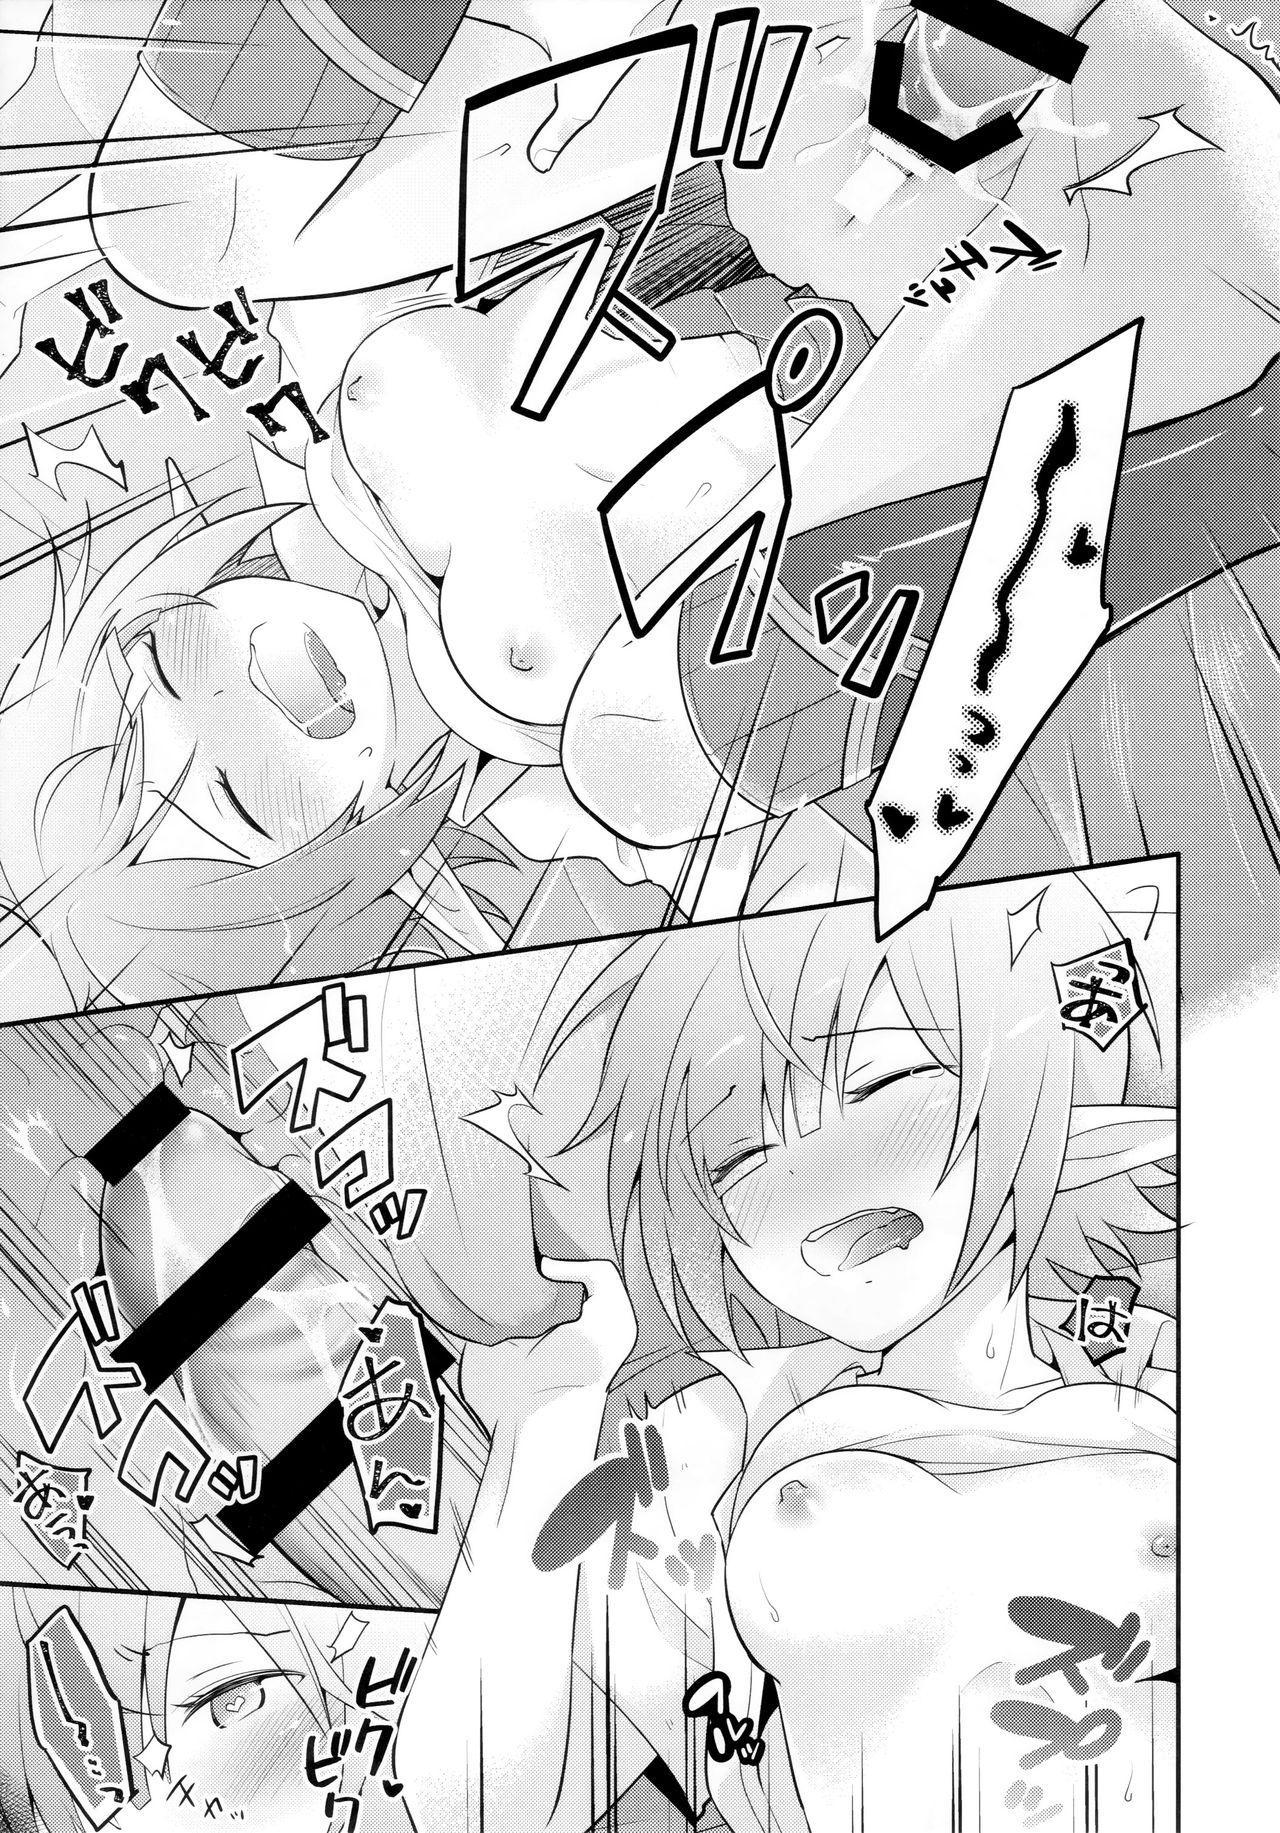 Aoi no Motto Otomodachi Daisakusen 17